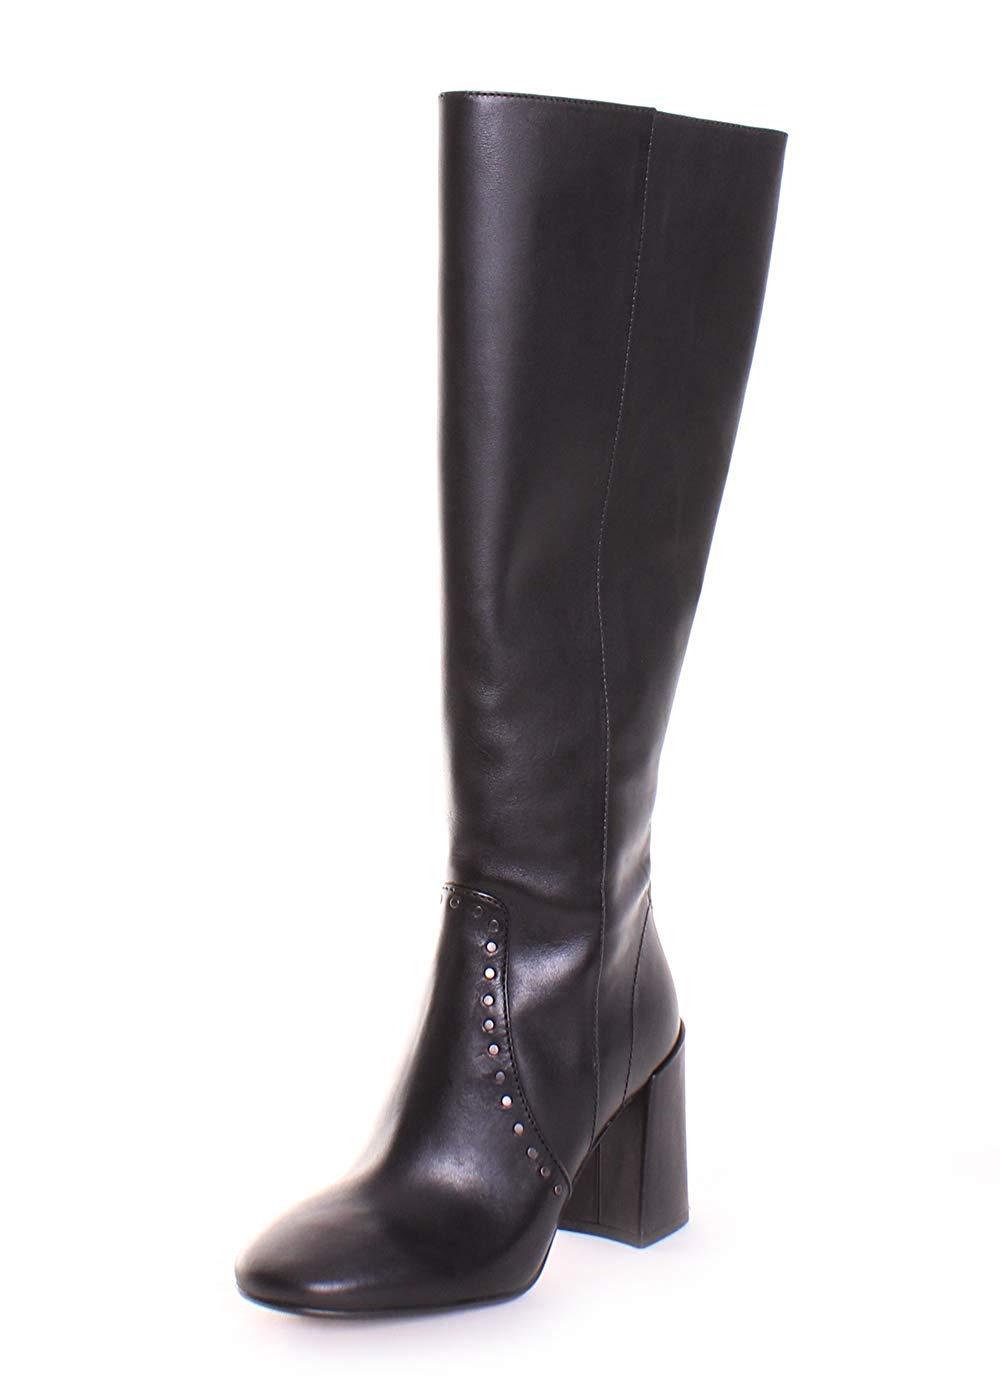 0b6bae12c8fe0 Coach Womens Falon Leather Round Toe Knee High Fashion